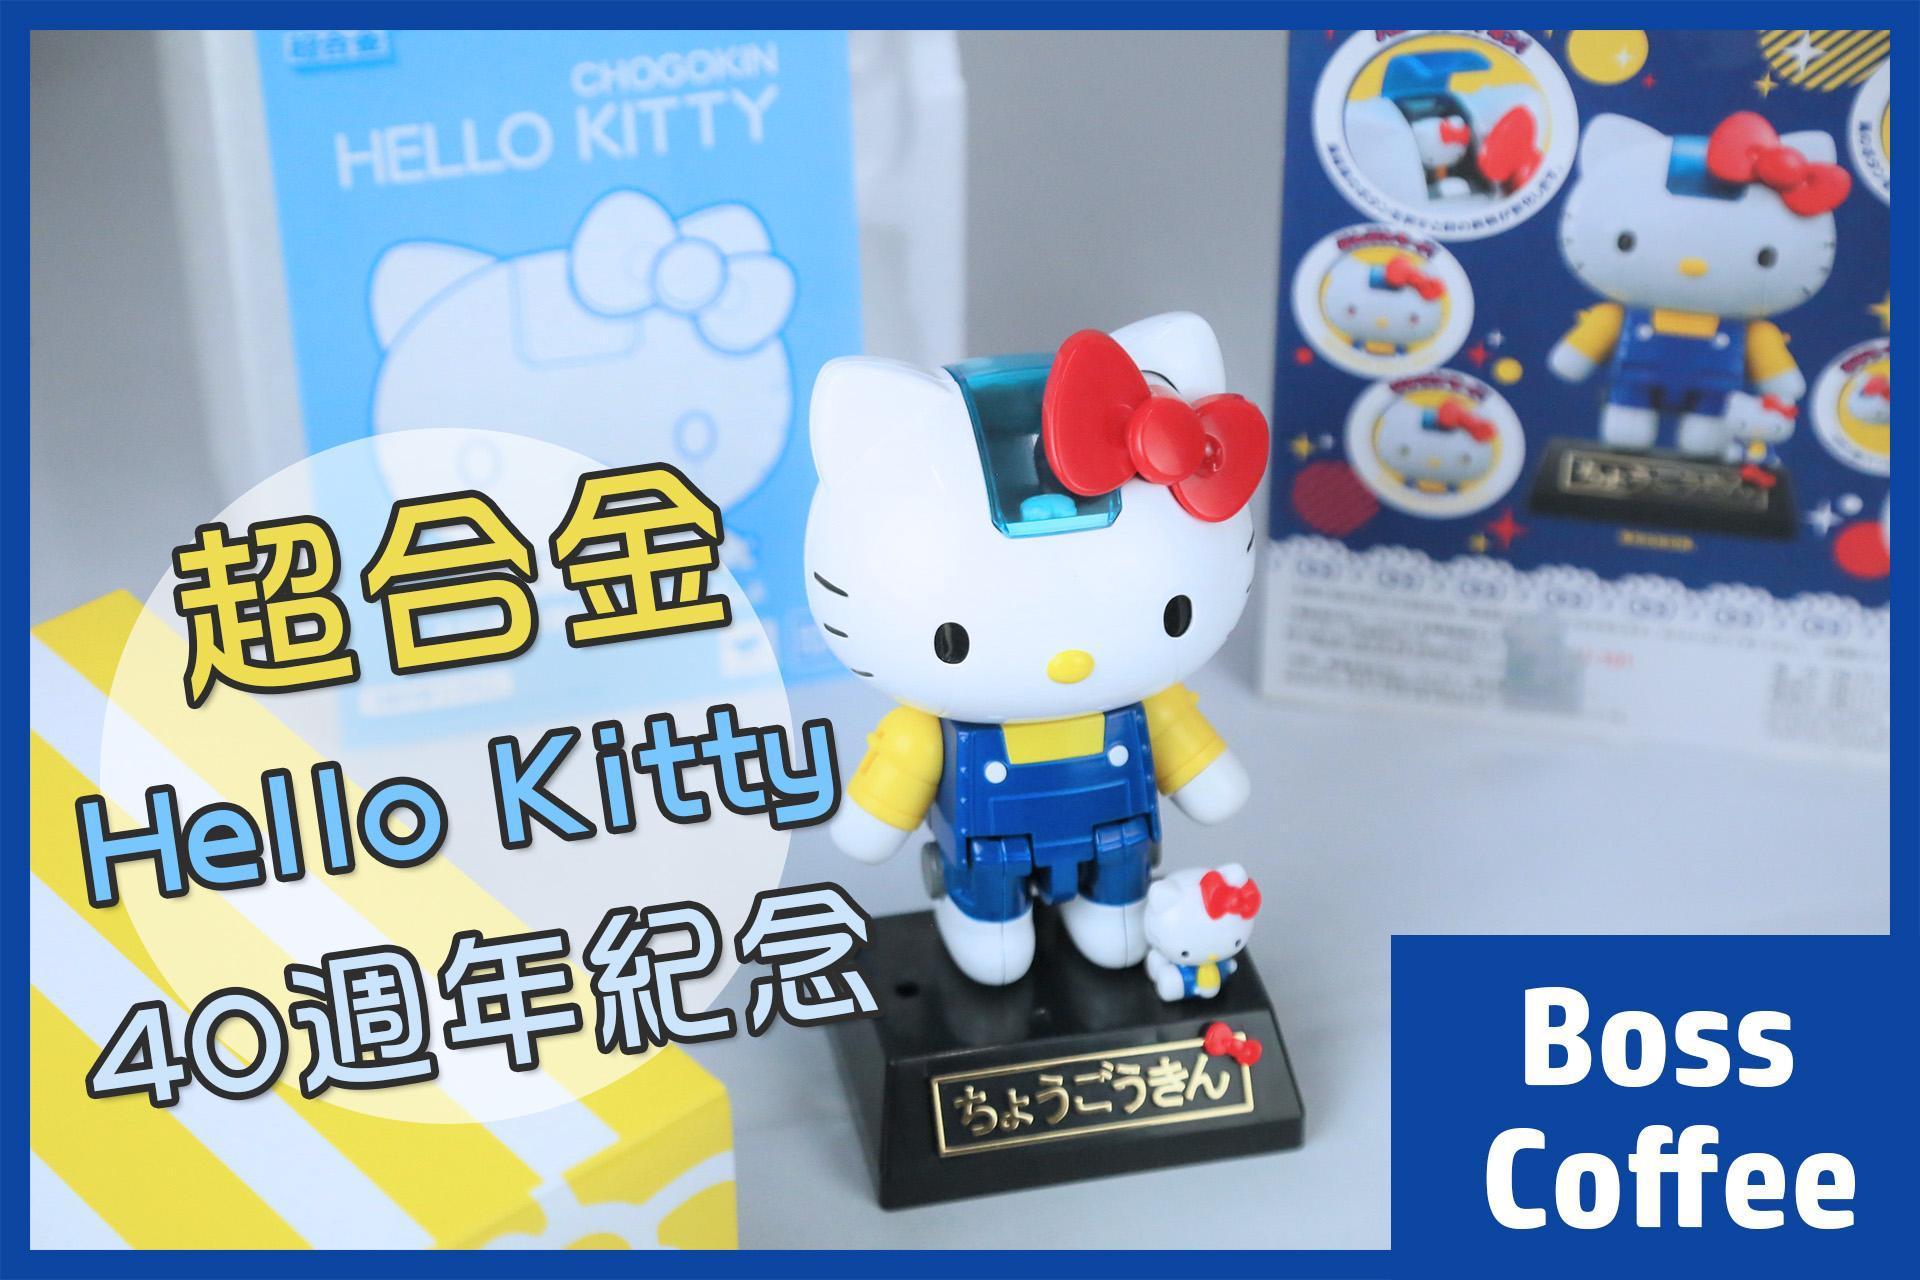 超合金Hello Kitty 40周年《波士咖啡》